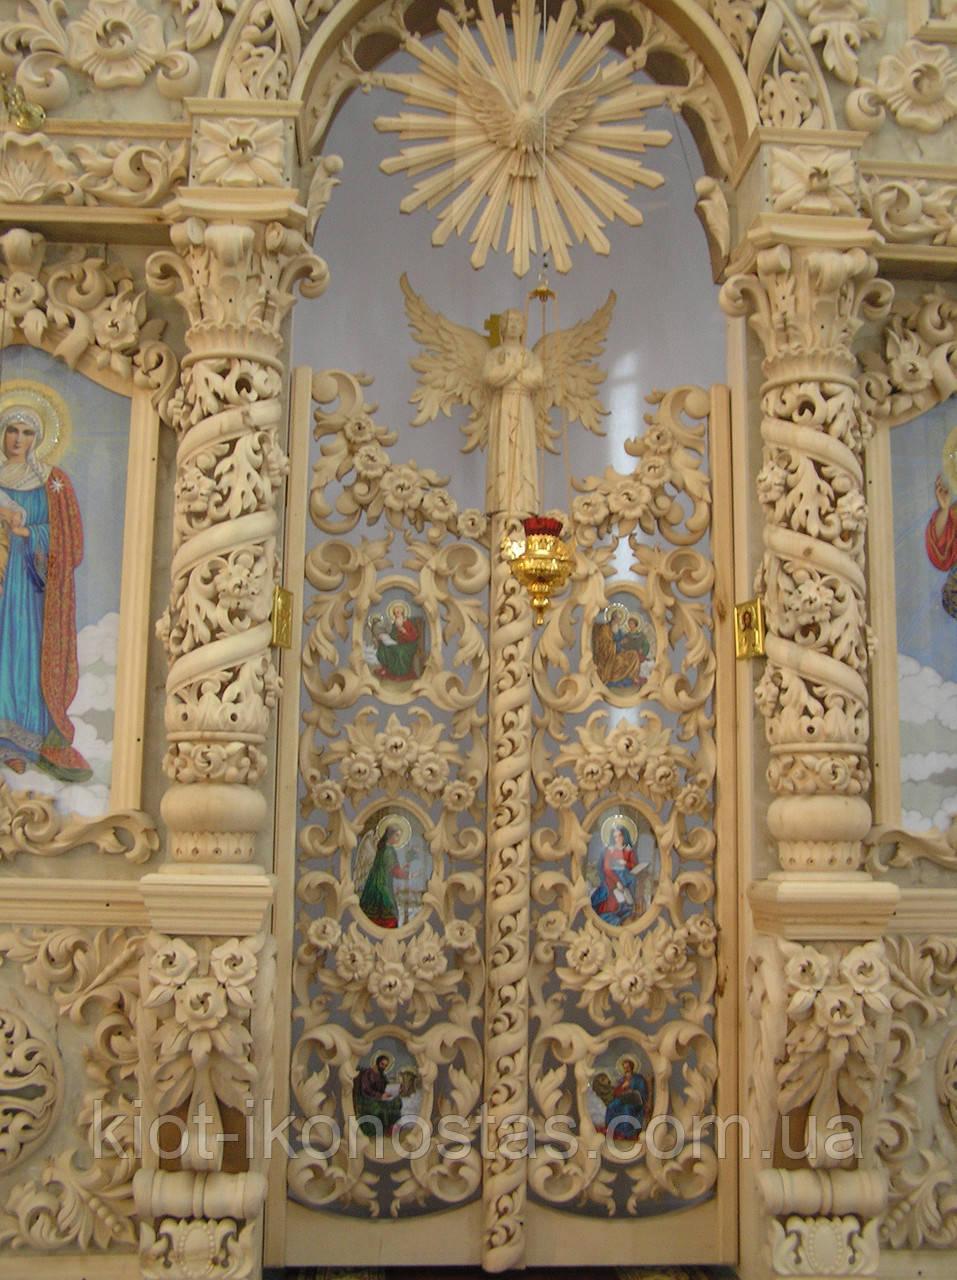 Царские Врата Барокко под позолоту